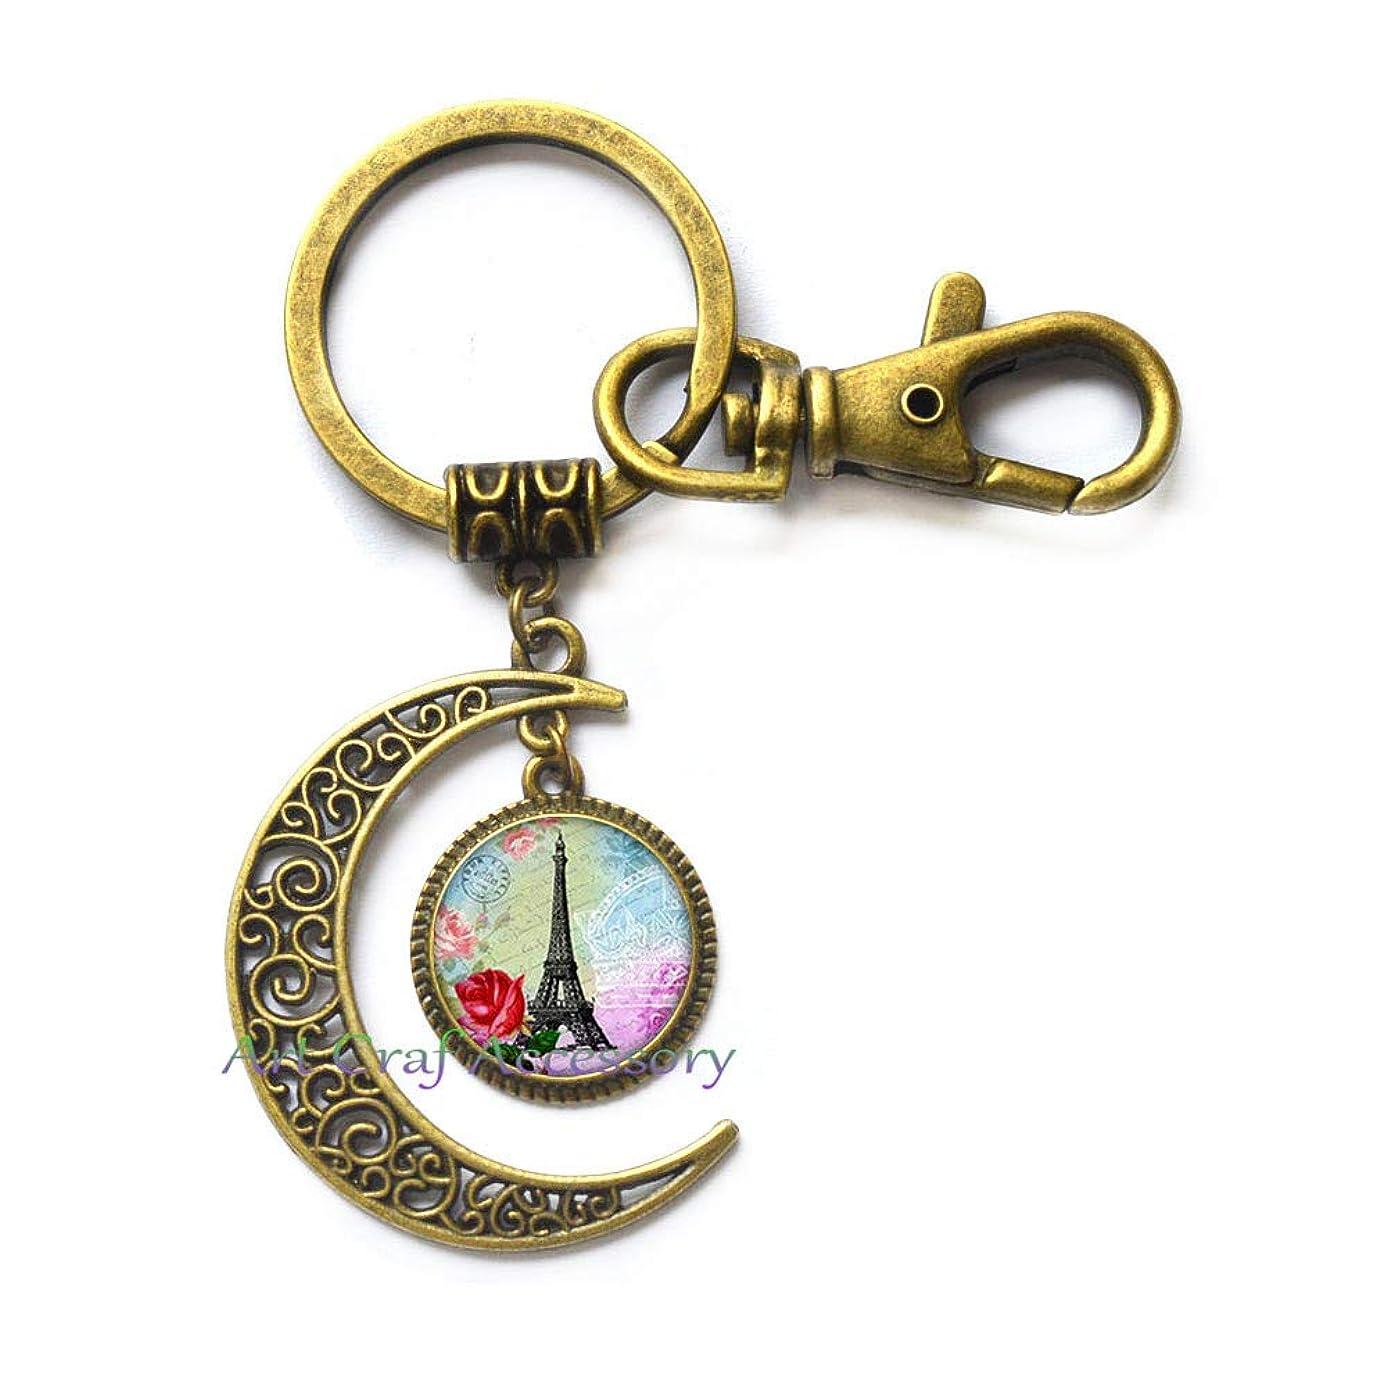 Paris Key Ring, France Moon Keychain, Silver Plated Key Ring, Paris France Jewelry,Glass Key Ring Moon Keychain Paris Jewelry,RN52 (G2)